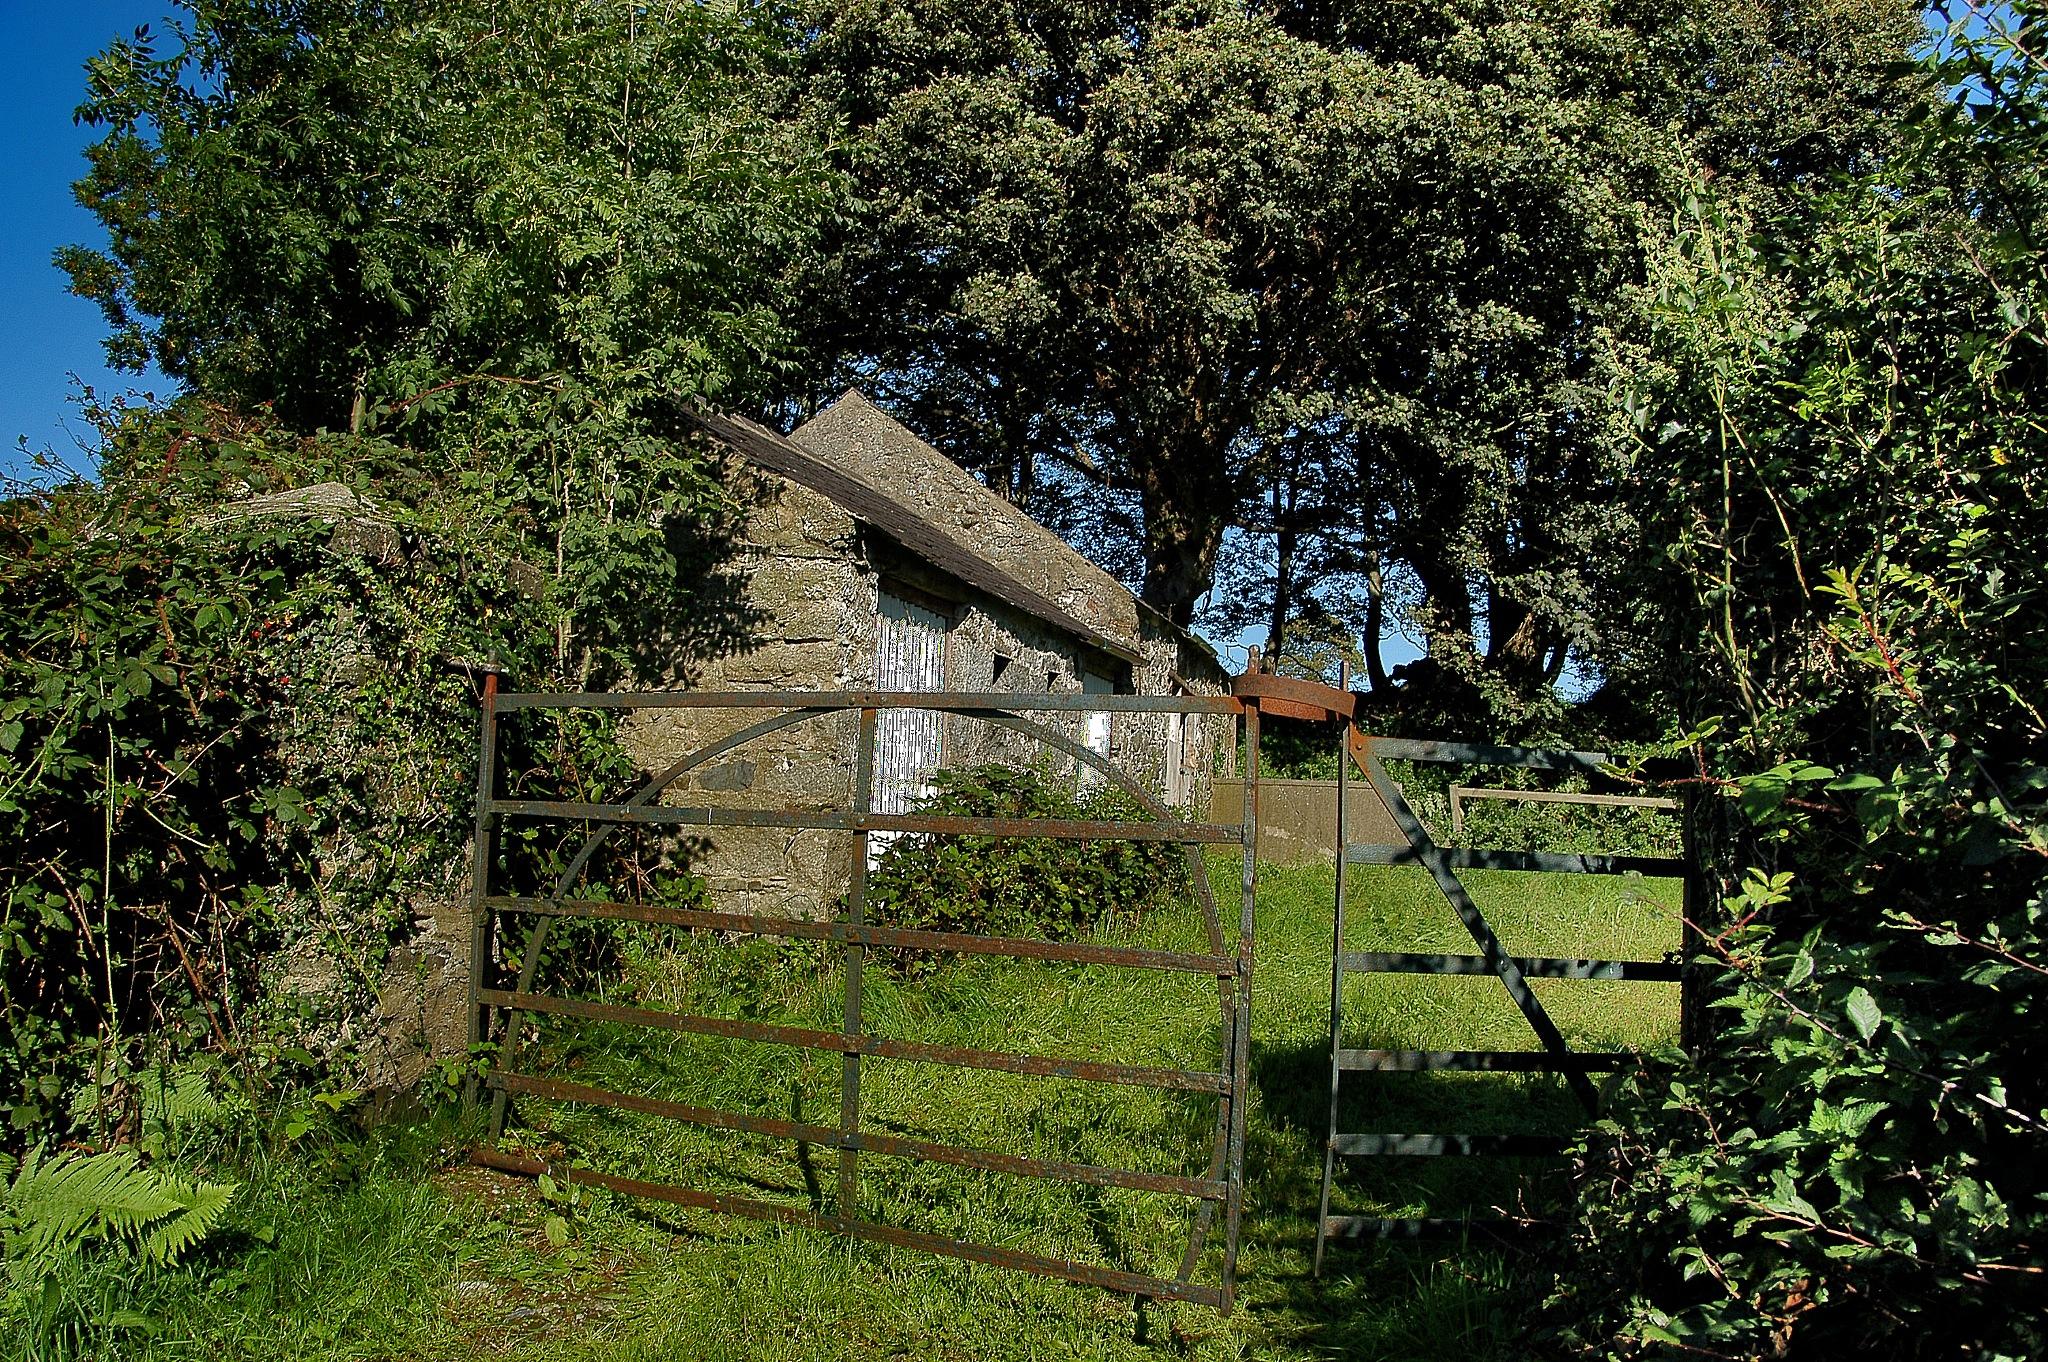 Blacksmith's Gate by PeterMChambers